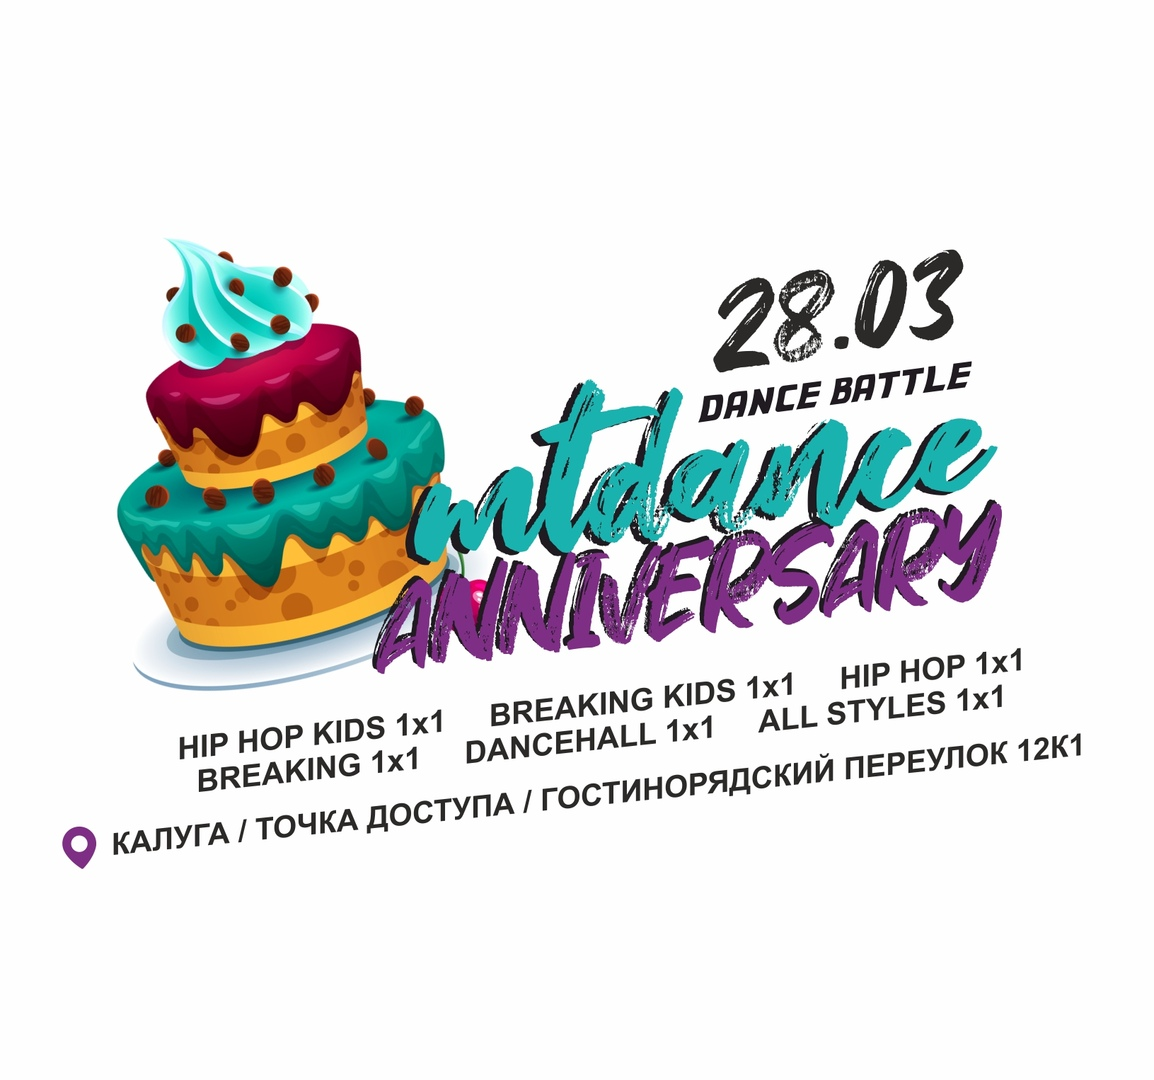 Афиша 28.03 / MTDANCE ANNIVERSARY DANCE BATTLE